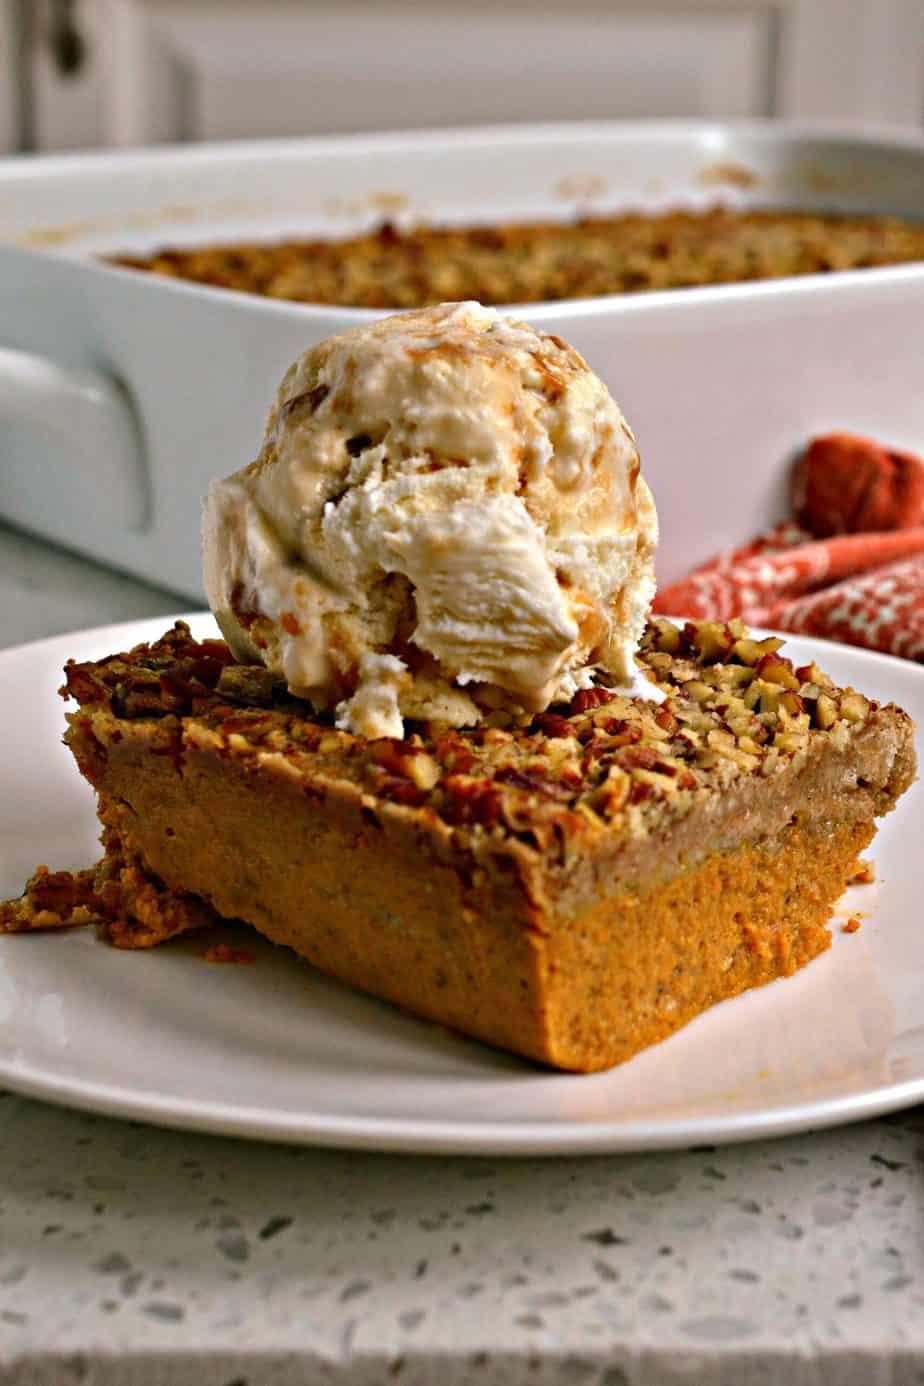 Pumpkin Dump Cake is a like a pumpkin pie with a sweet crunchy cinnamon pecan topping.